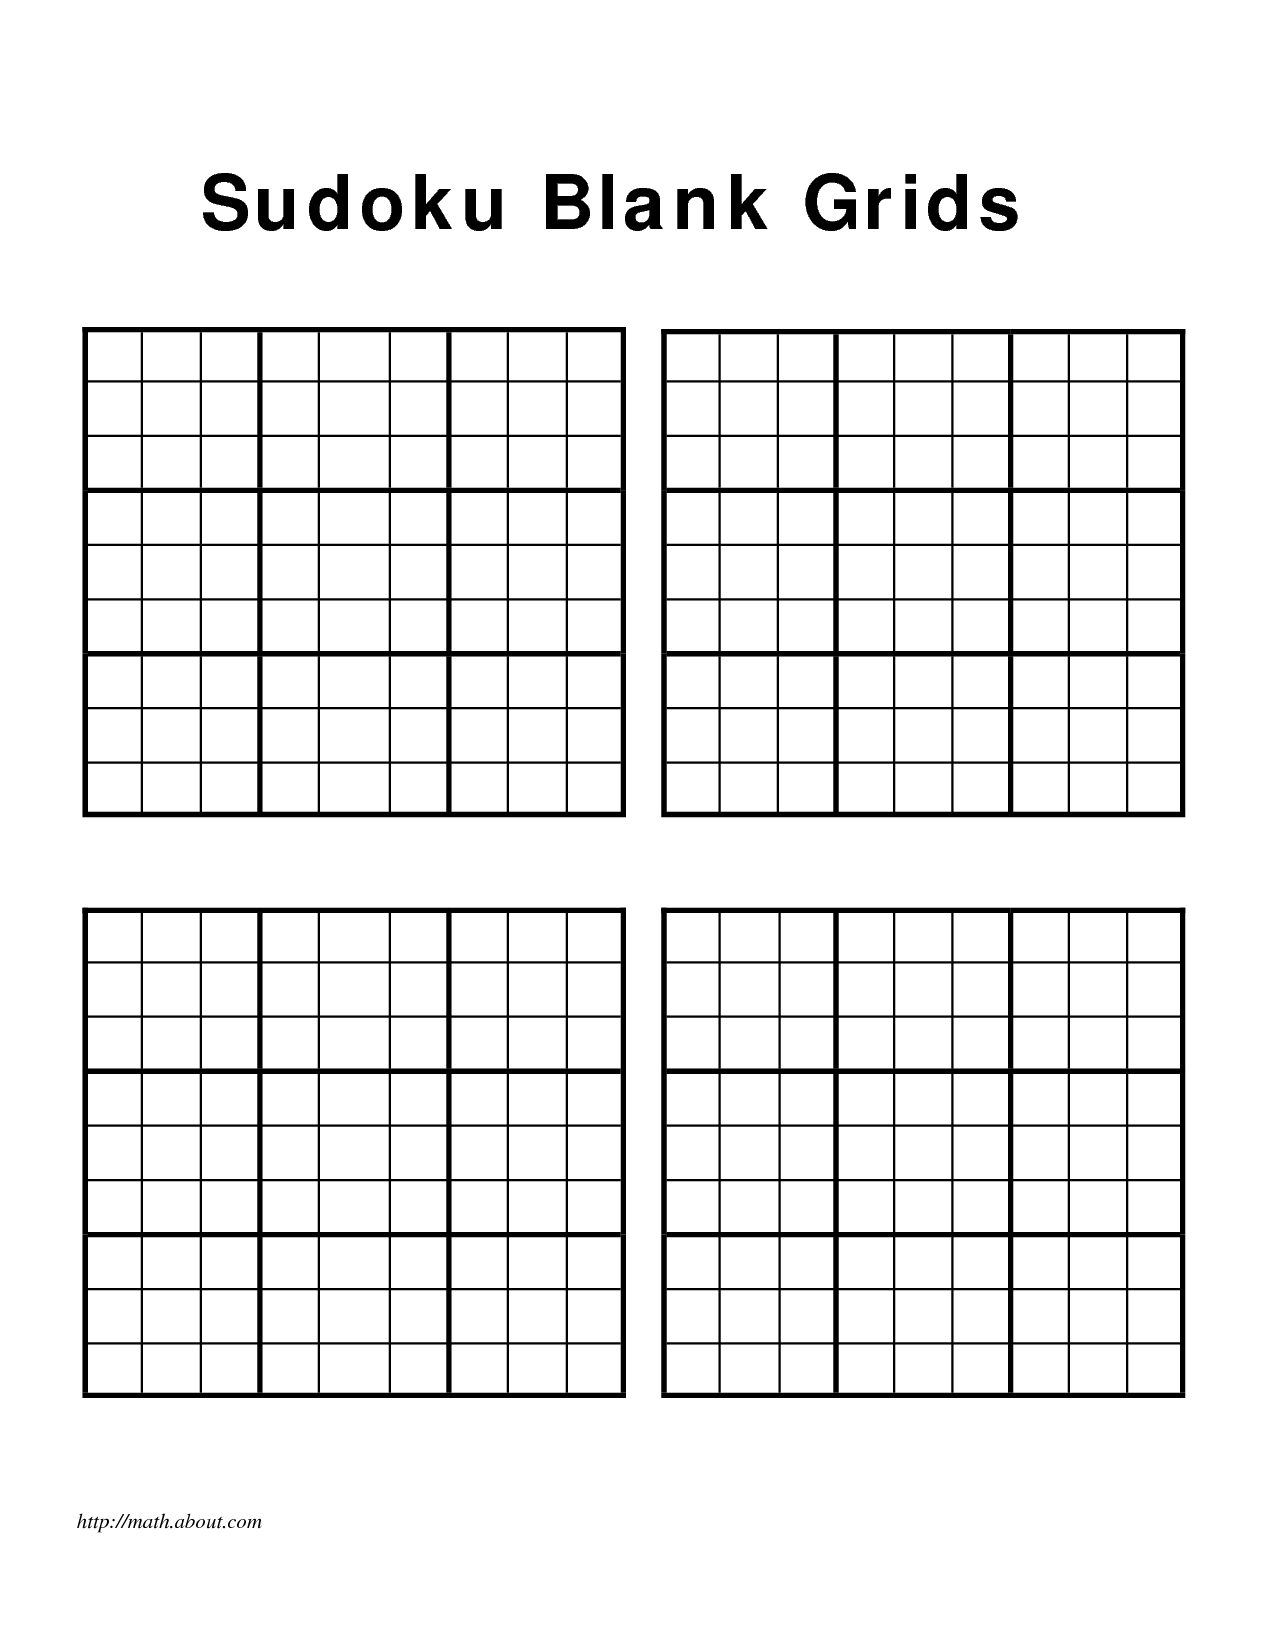 Free+Printable+Blank+Sudoku+Grids   Sudoku, Sudoku Printable